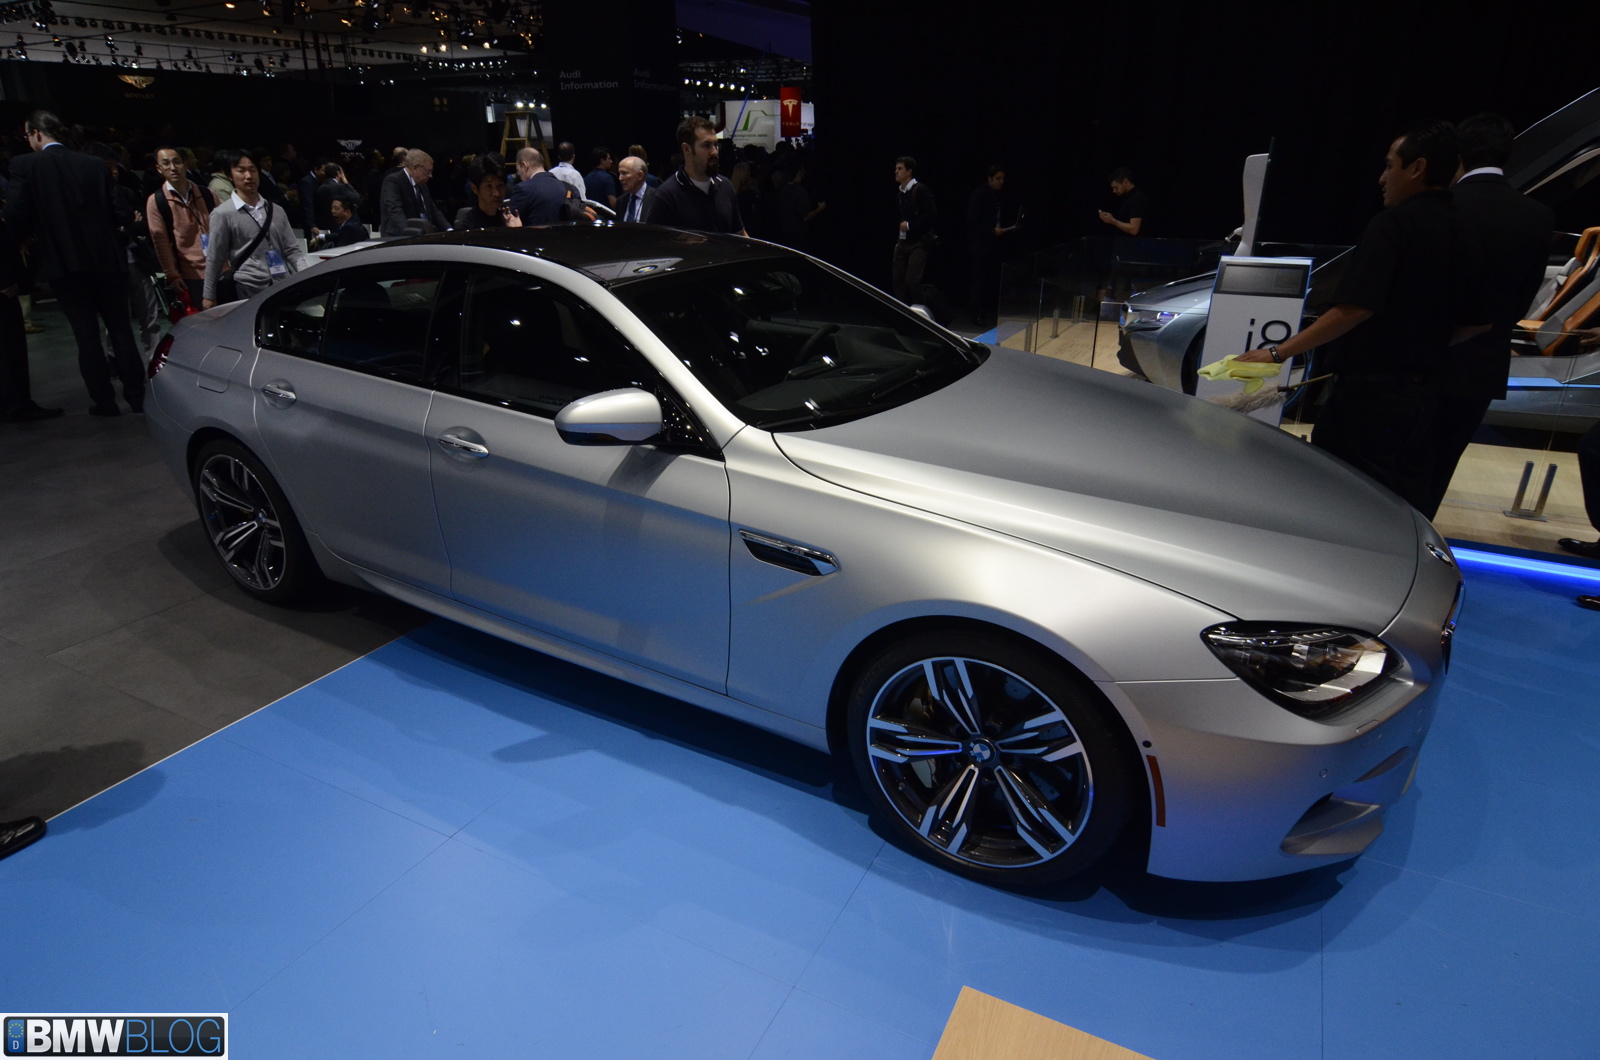 2014 bmw m6 gran coupe 01